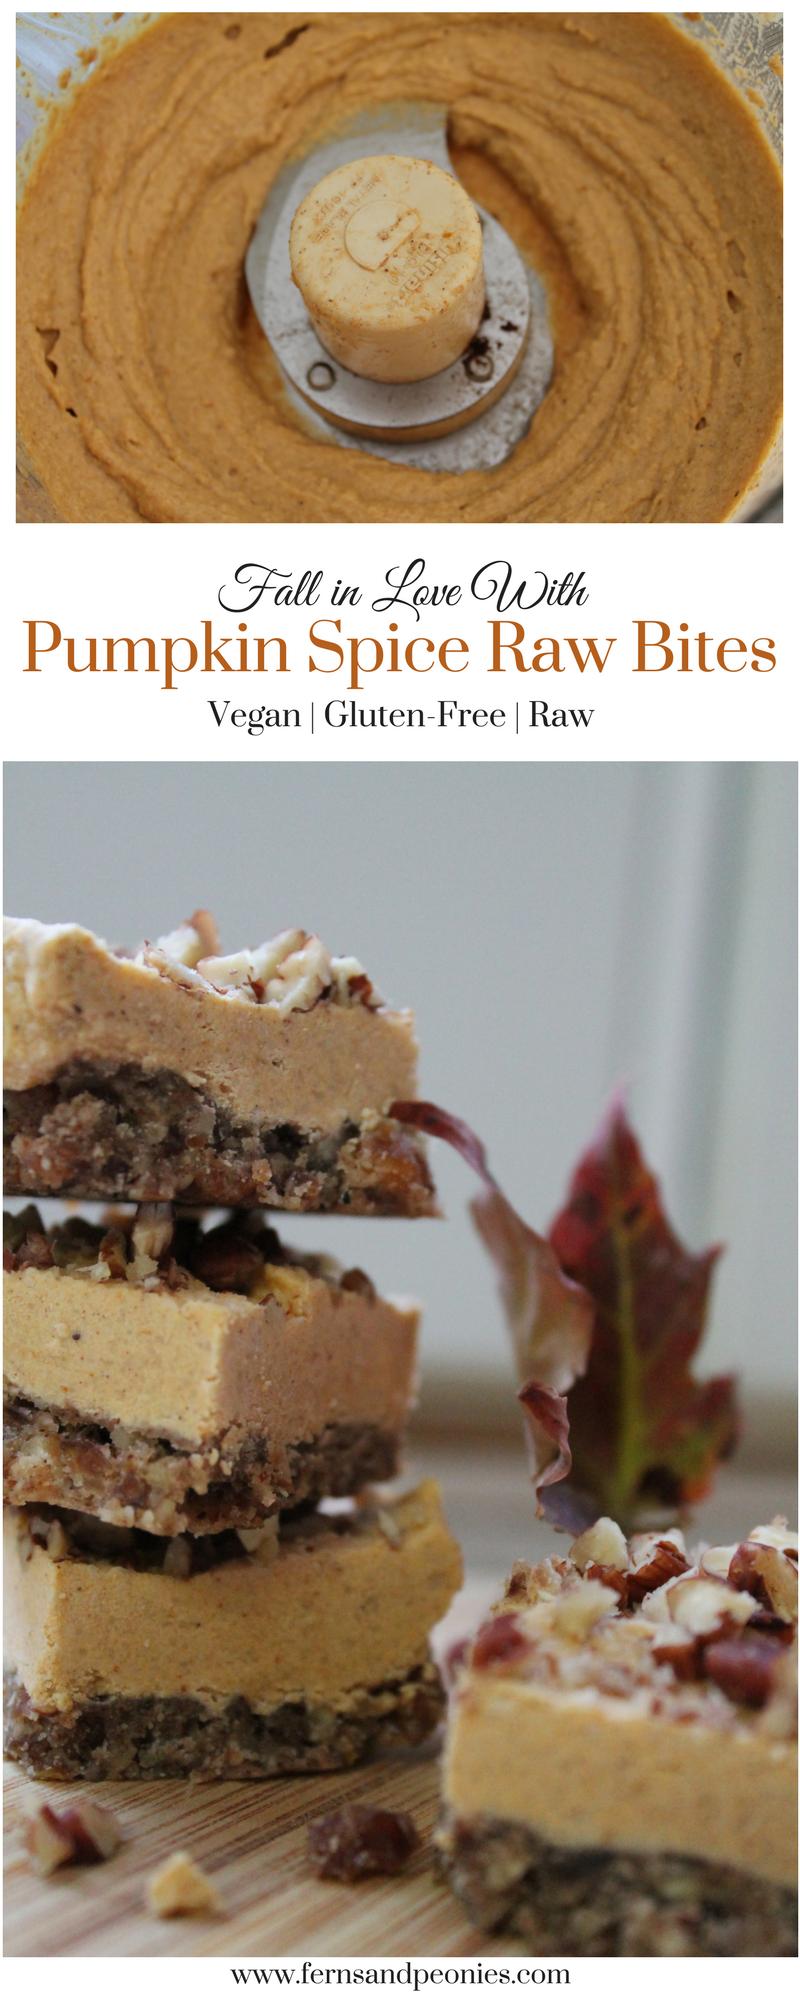 Pumpkin Spice Raw Bites from www.fernsandpeonies.com